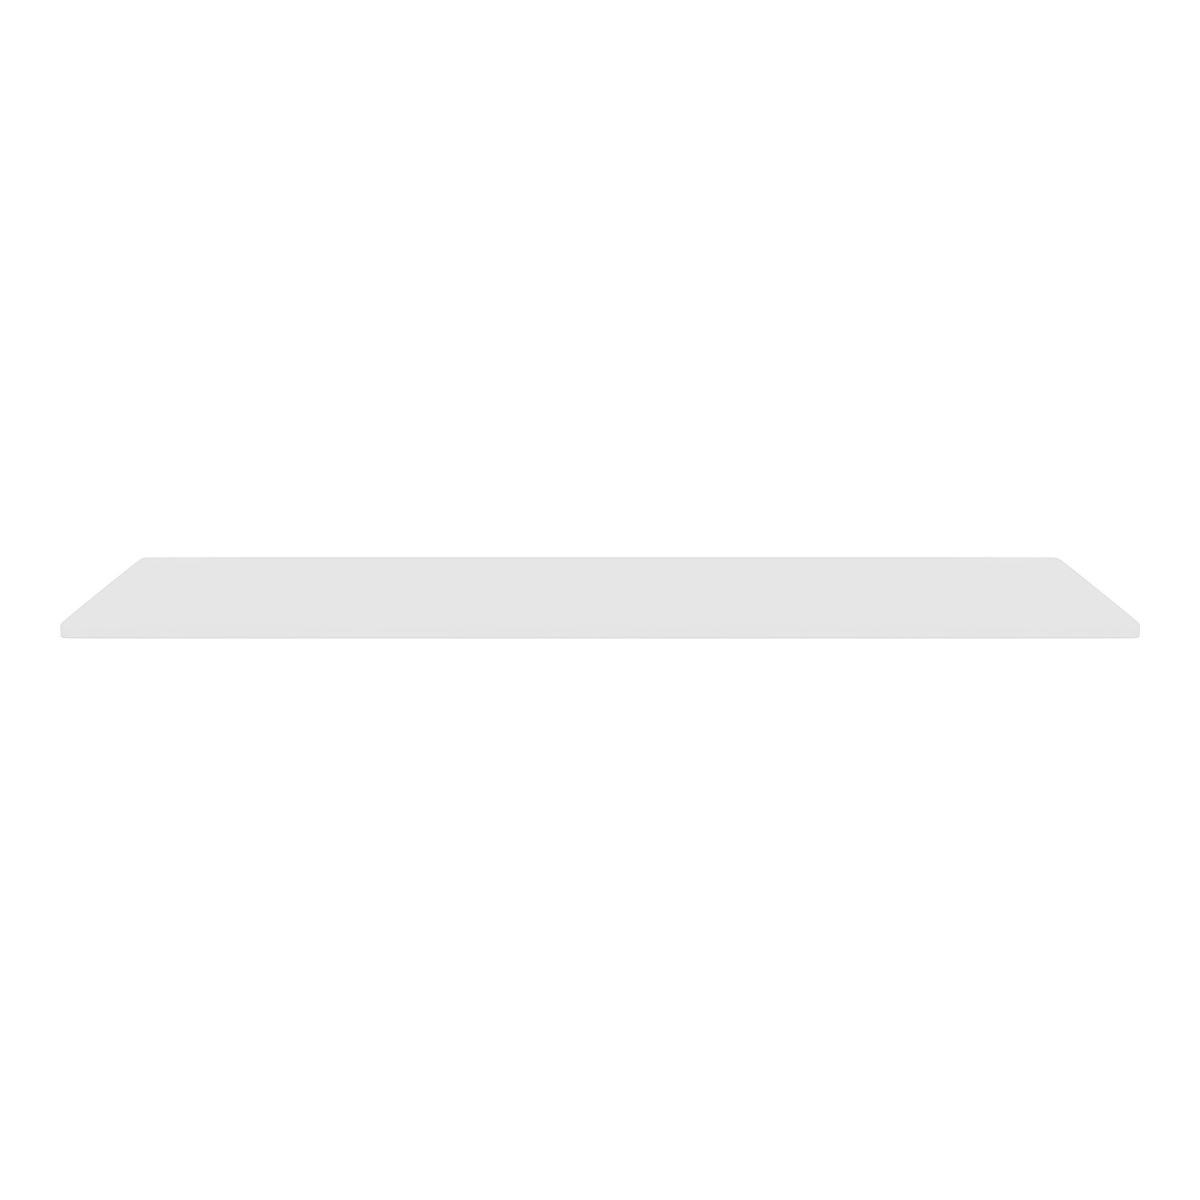 Montana Toppskiva Wire 70,1x34,8cm New White